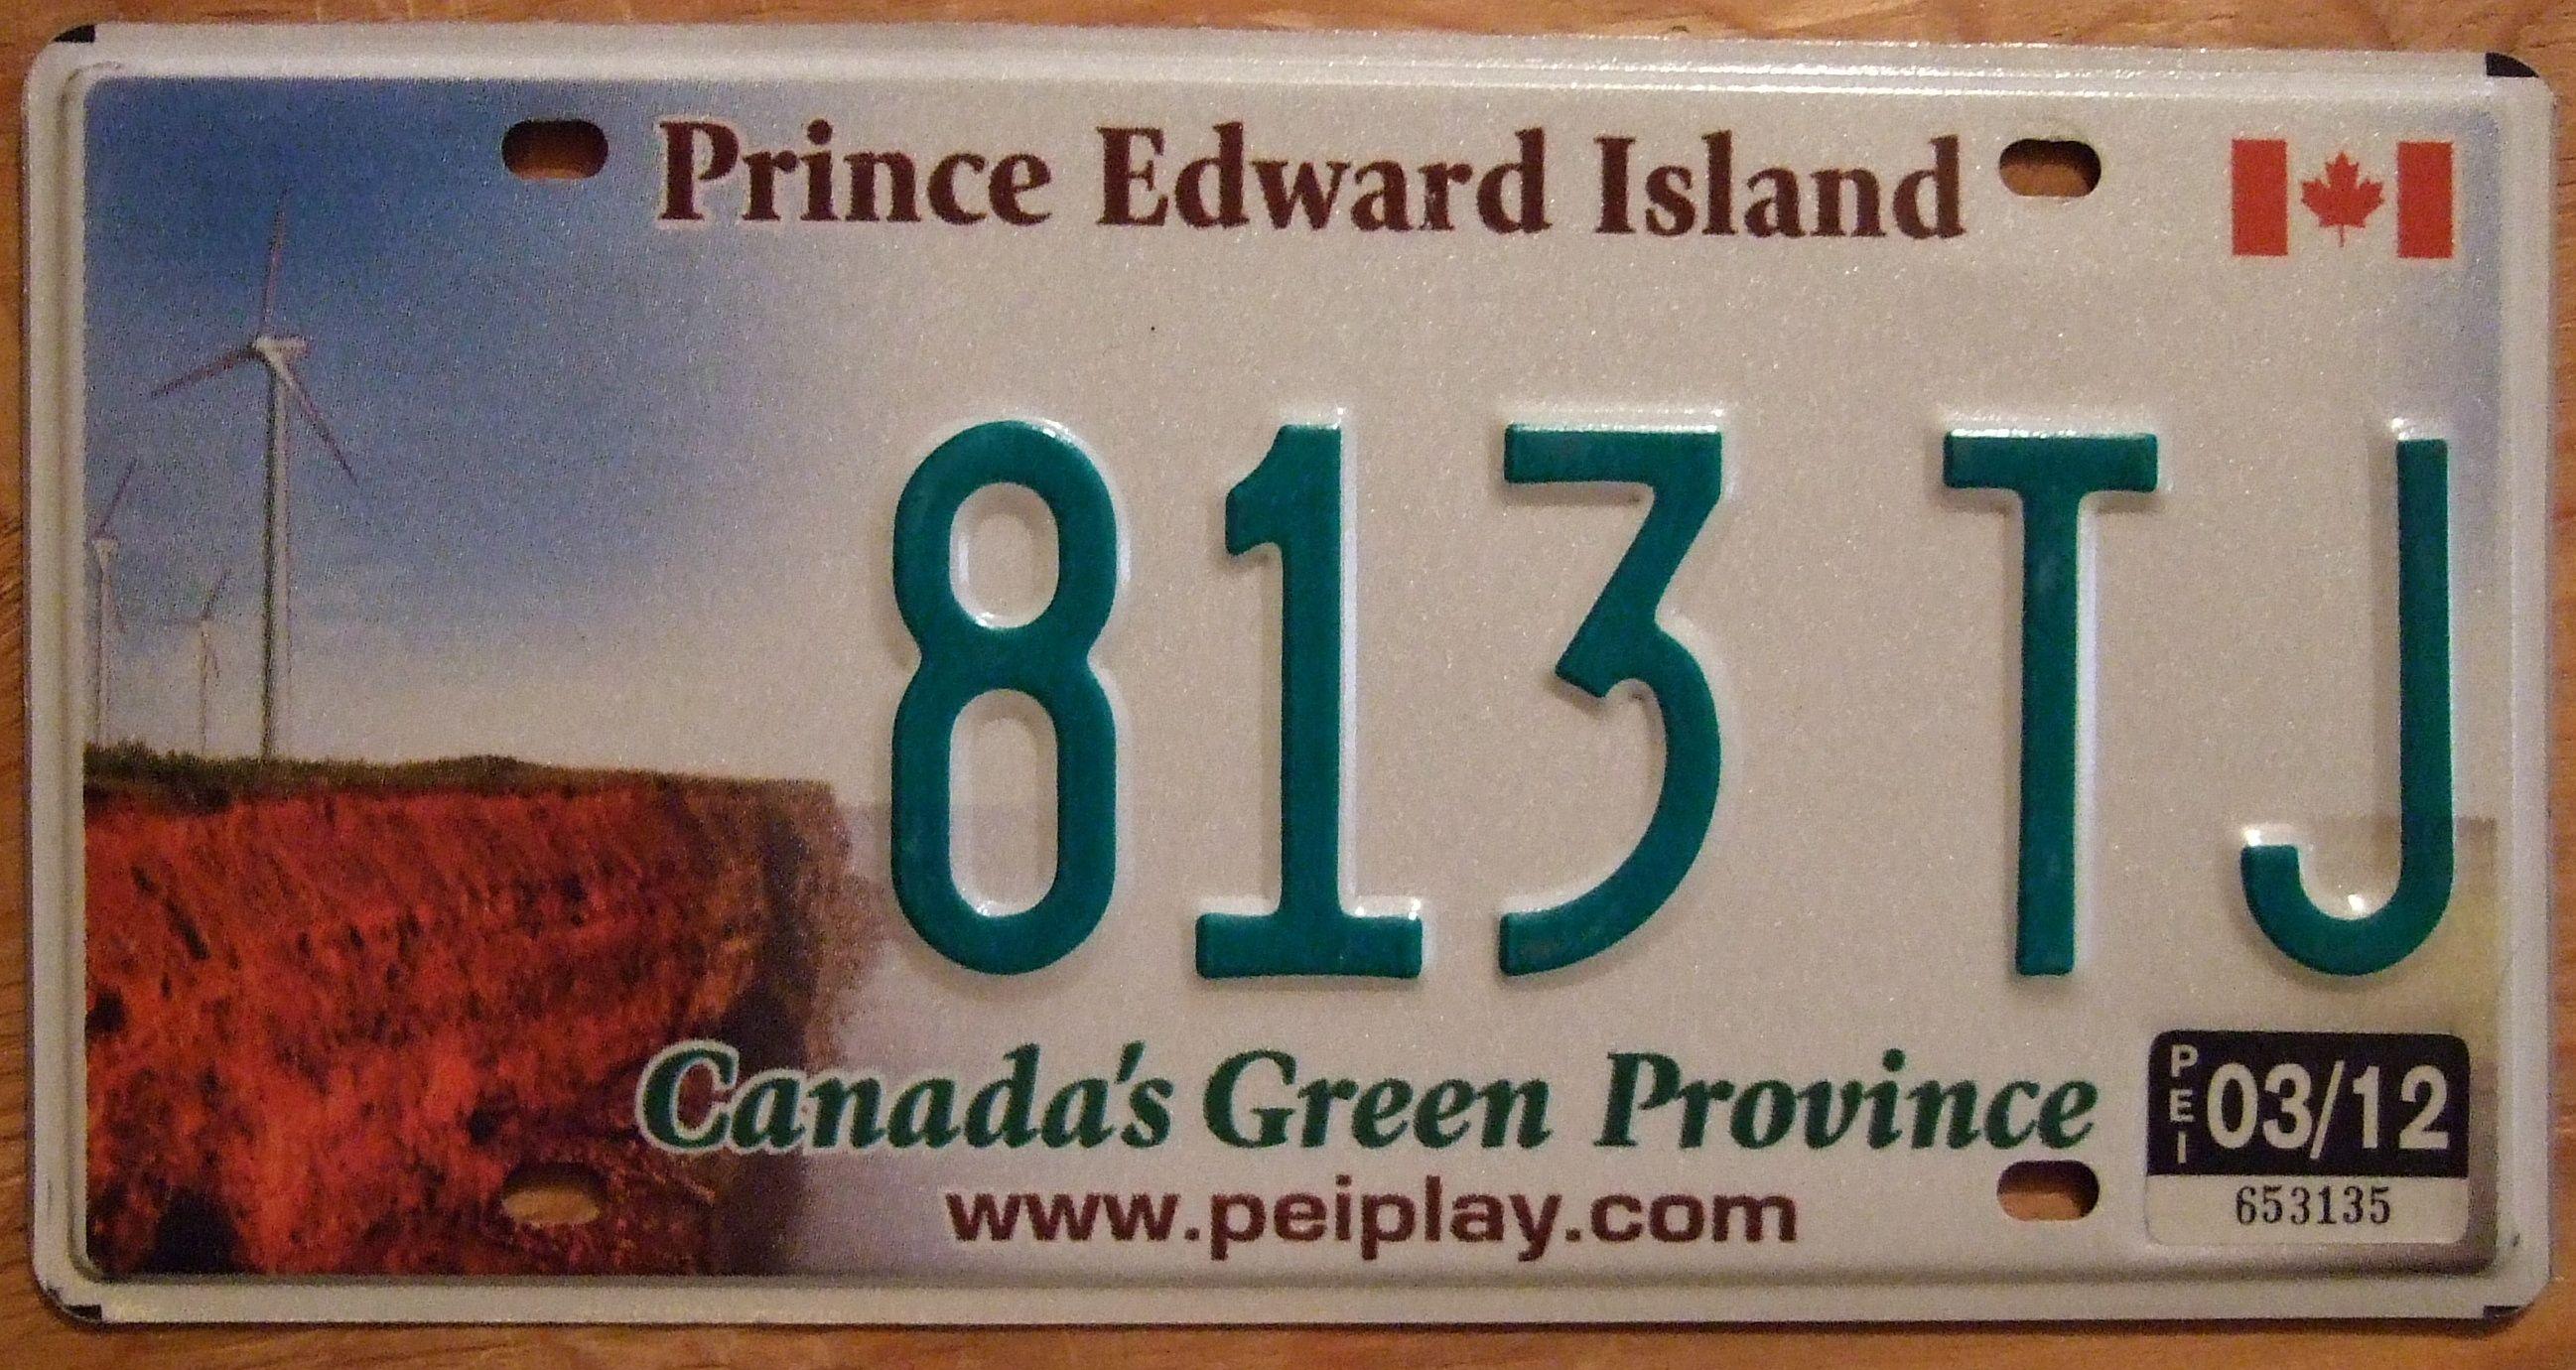 Prince Edward Island, Canada's Green Province